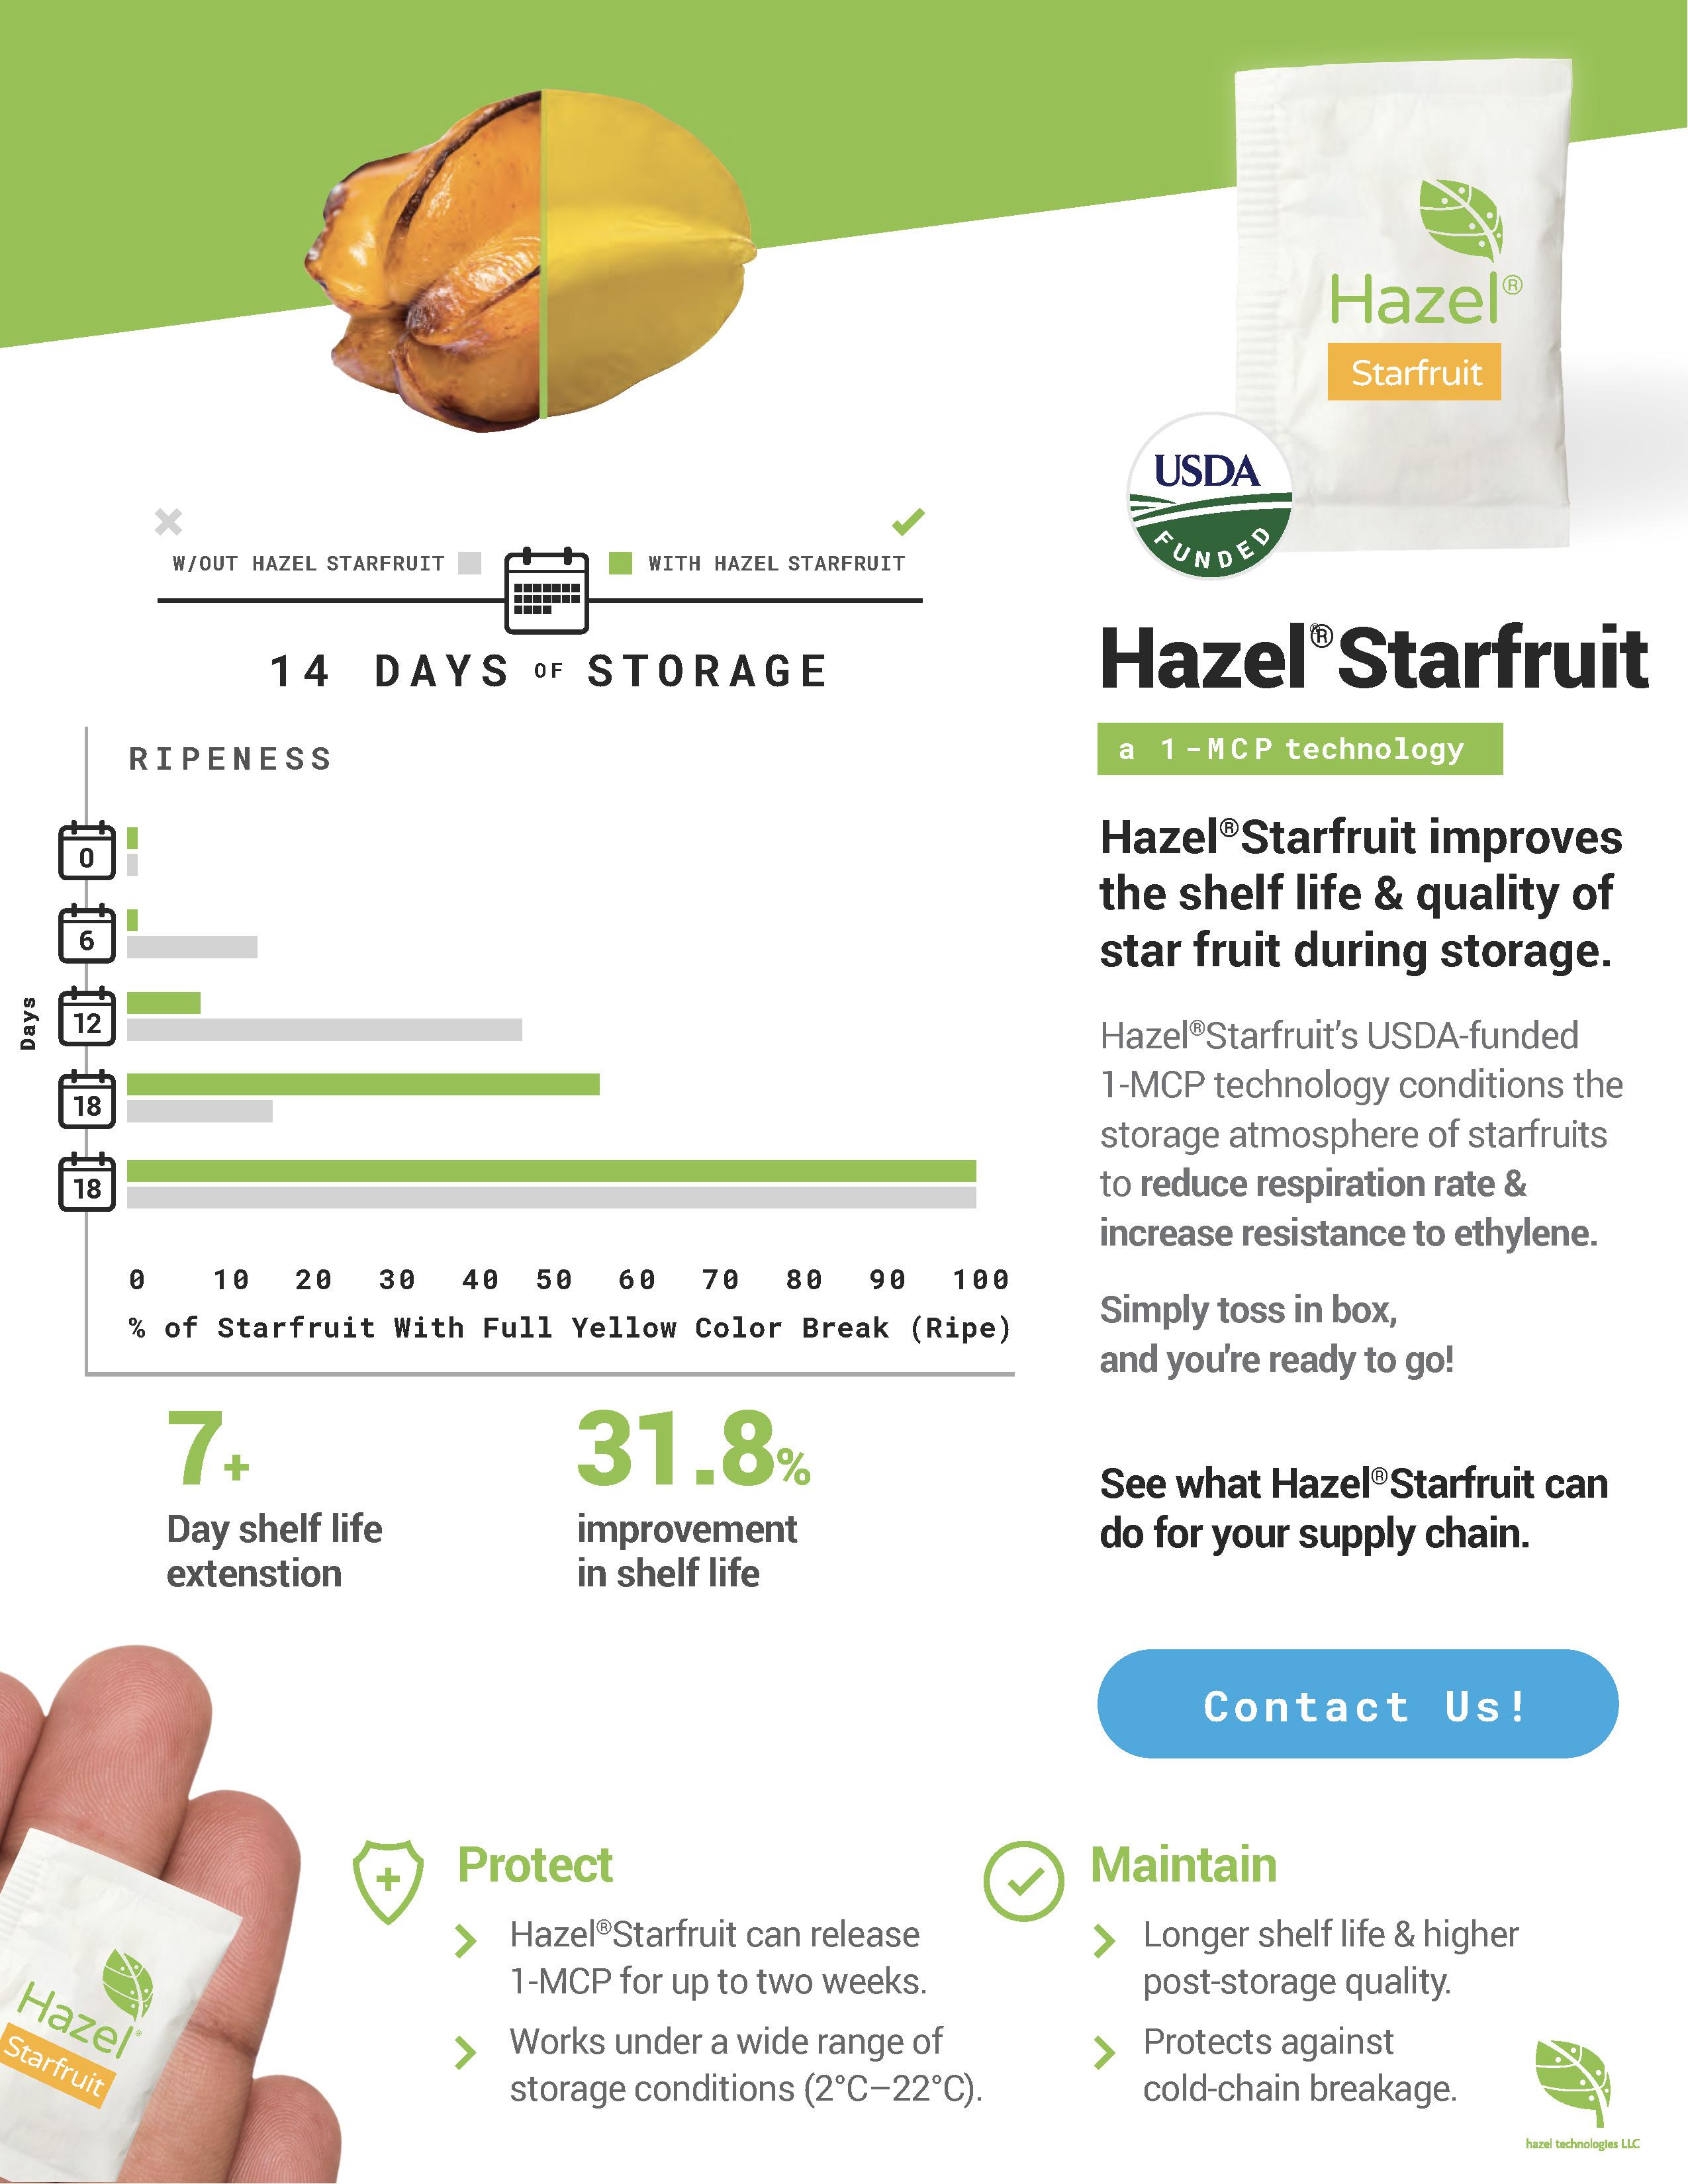 Hazel Starfruit